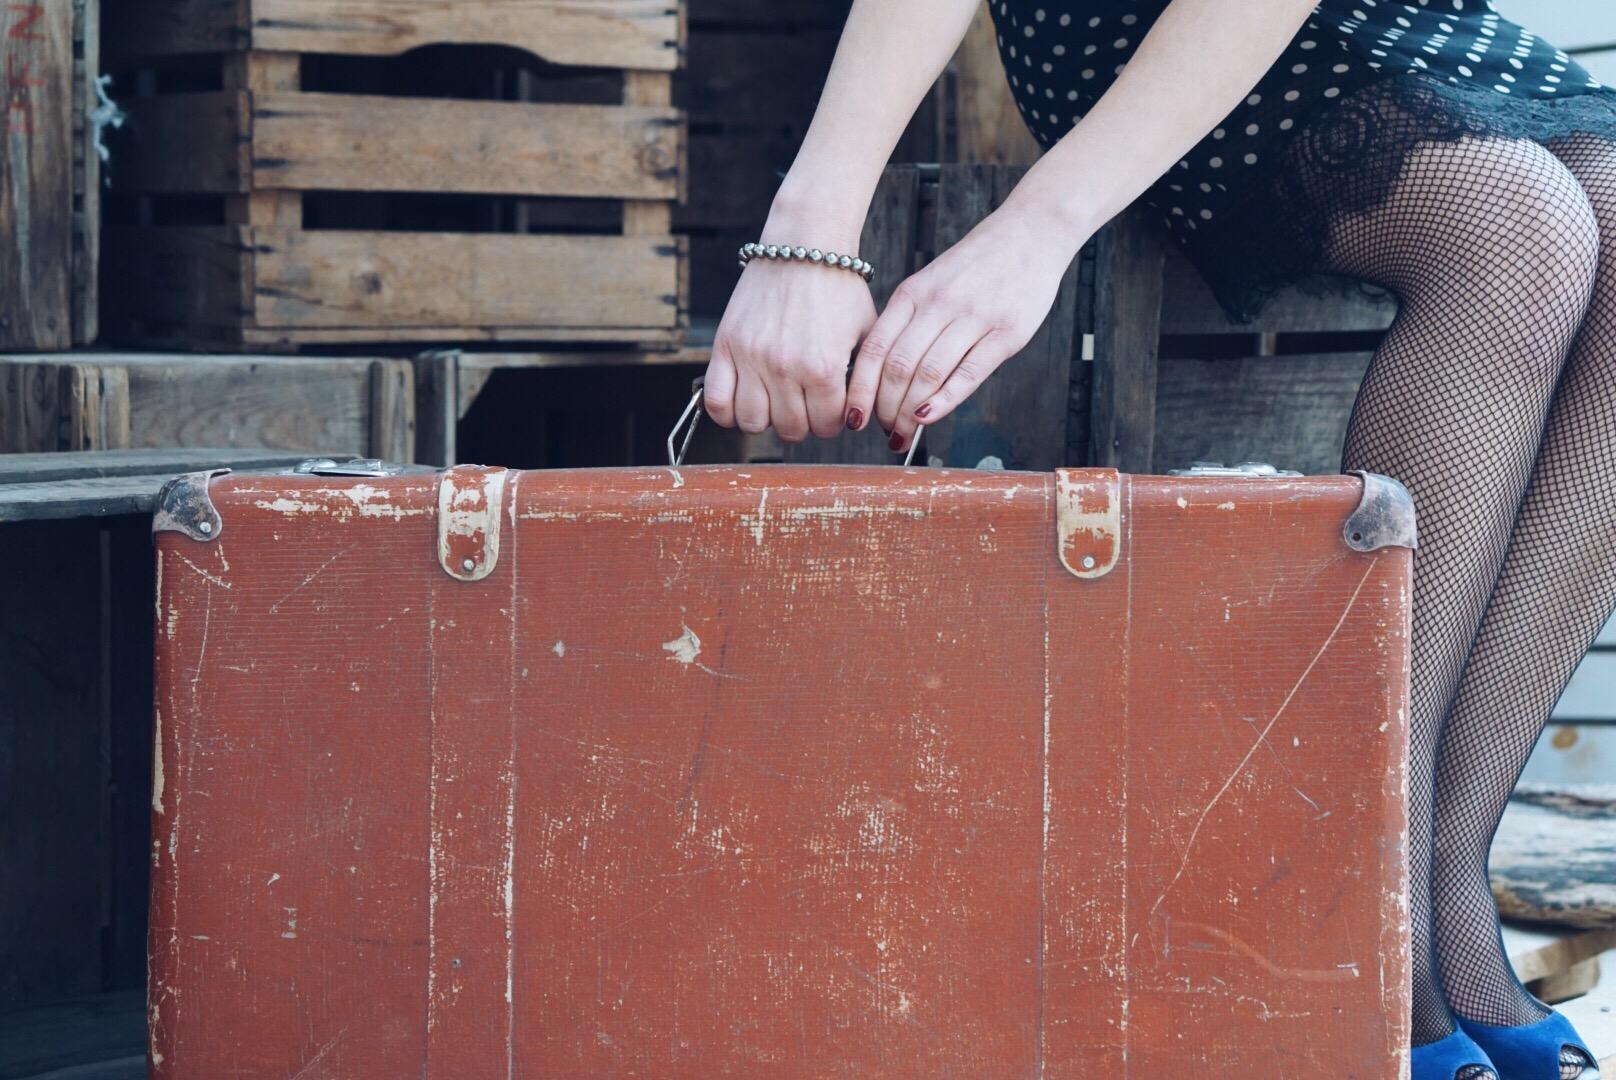 La Tendance Recyclage dans la Mode